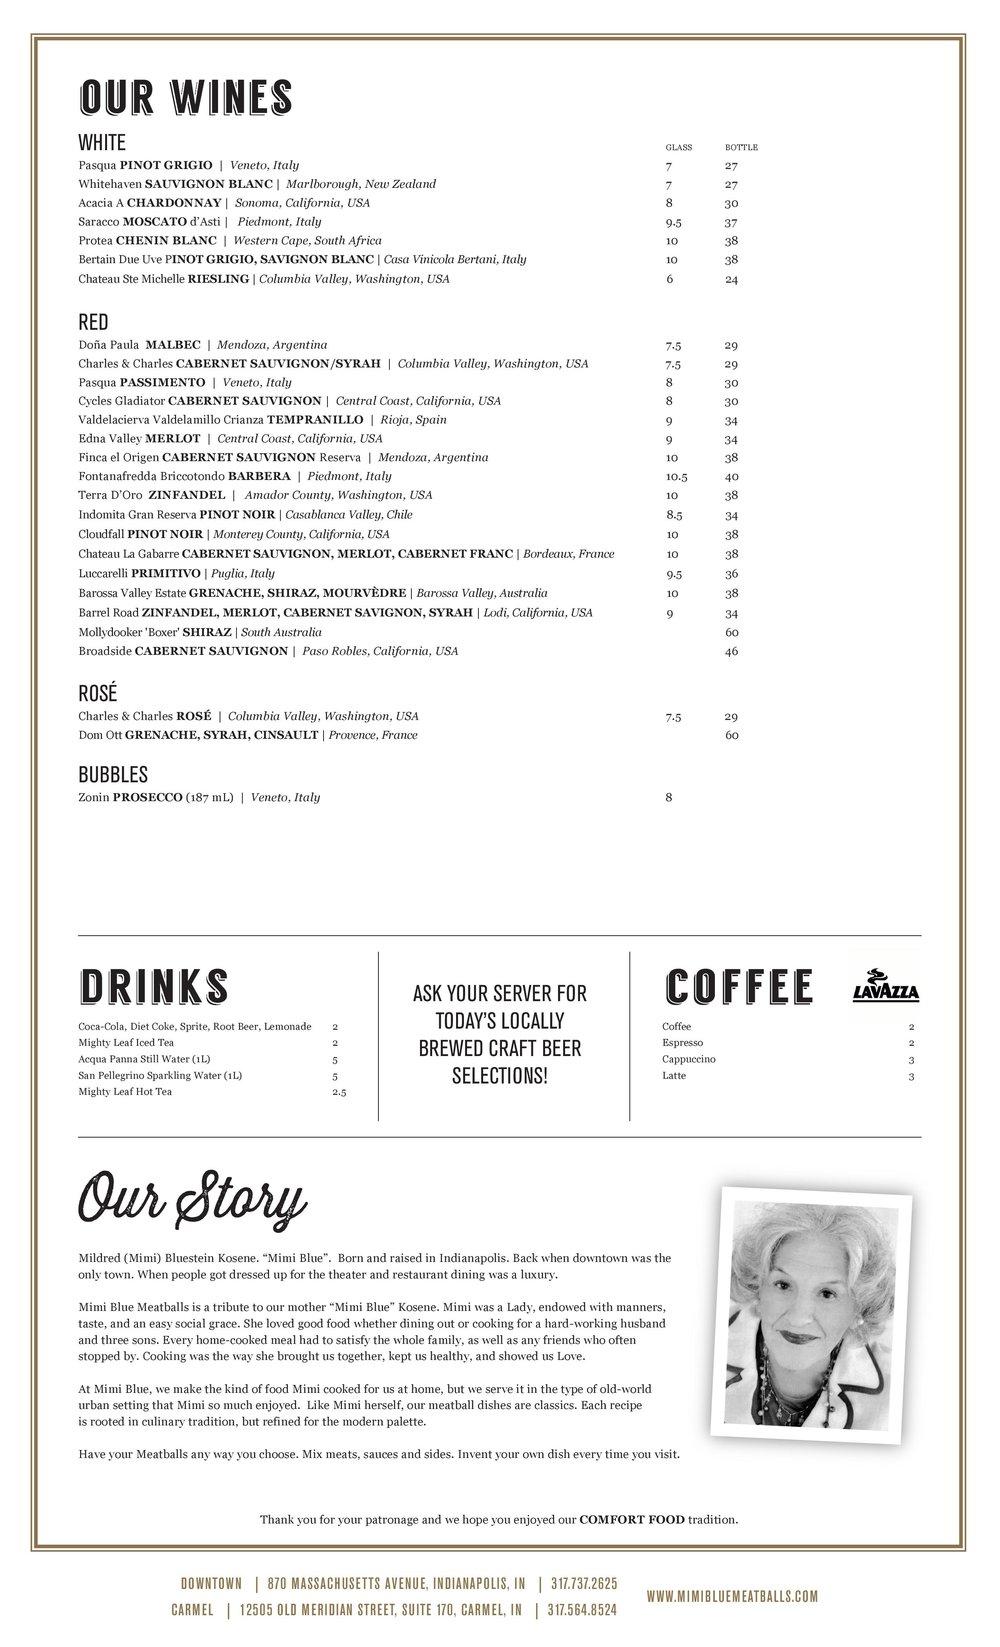 Mimi Blue Menu 2.14.18-page-002.jpg